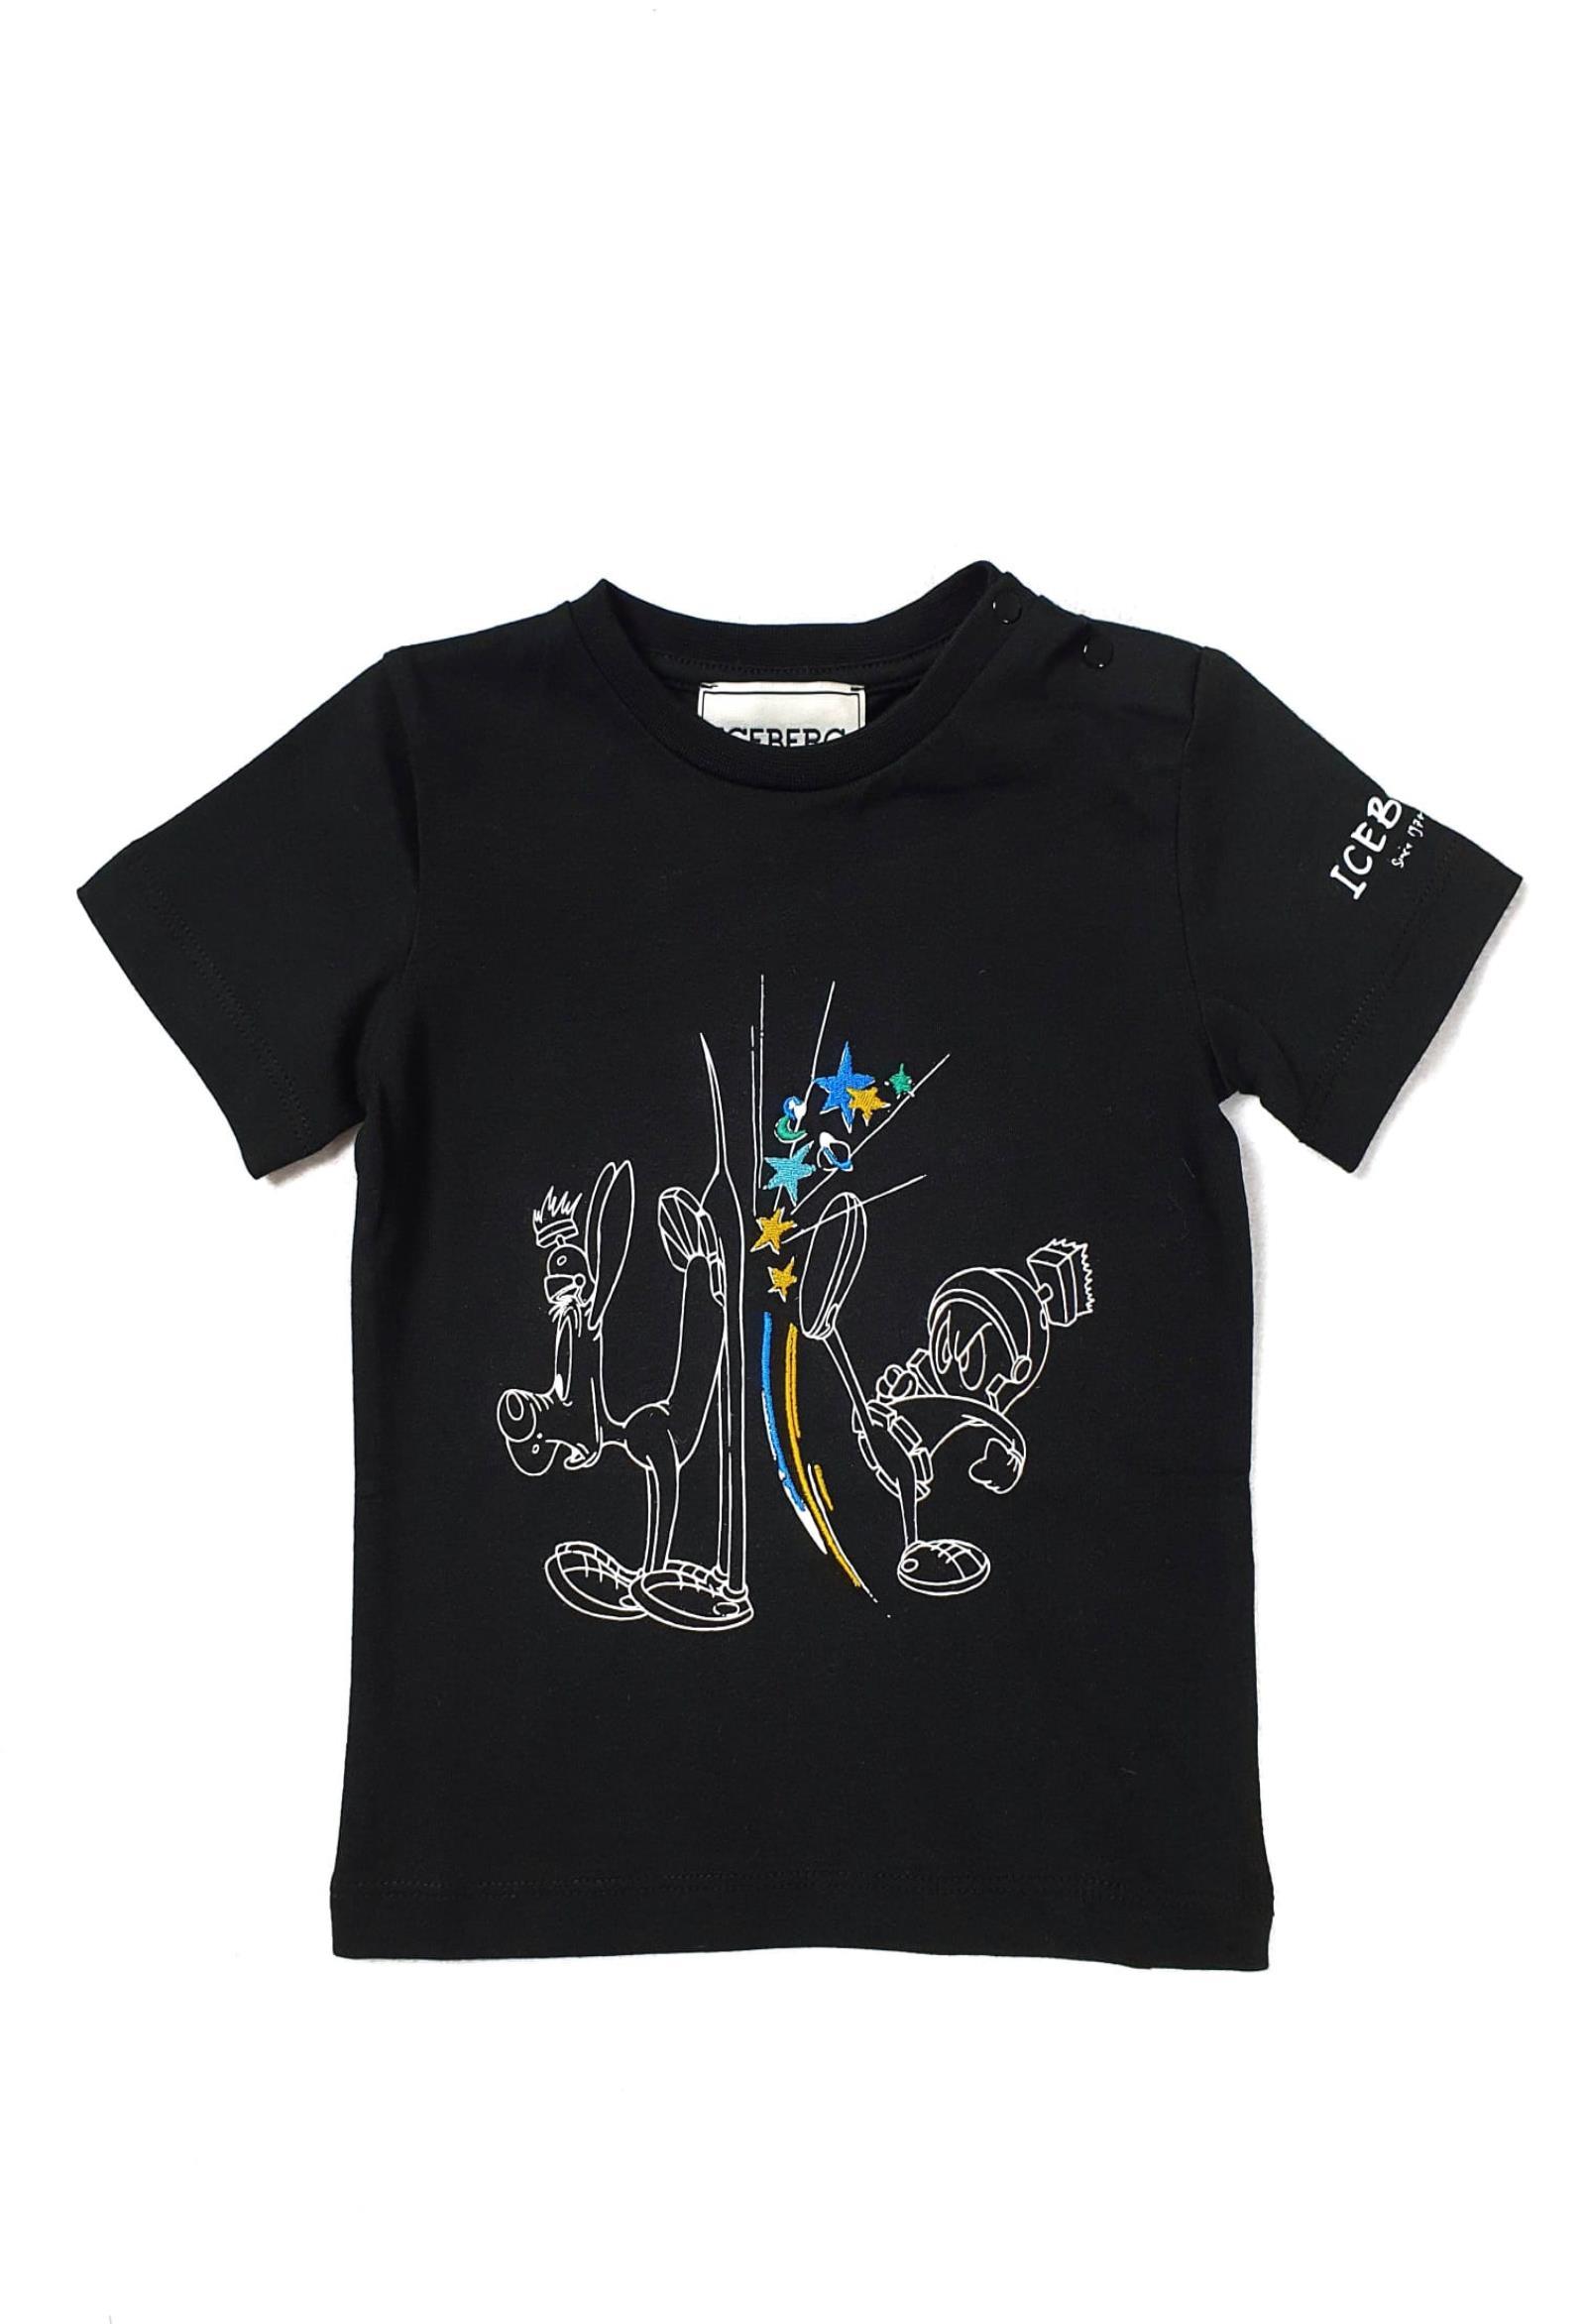 T-SHIRT NERA CON STAMPA FRONTALE LOONEY TUNES iceberg | T-shirt | TSICE1128BUNI